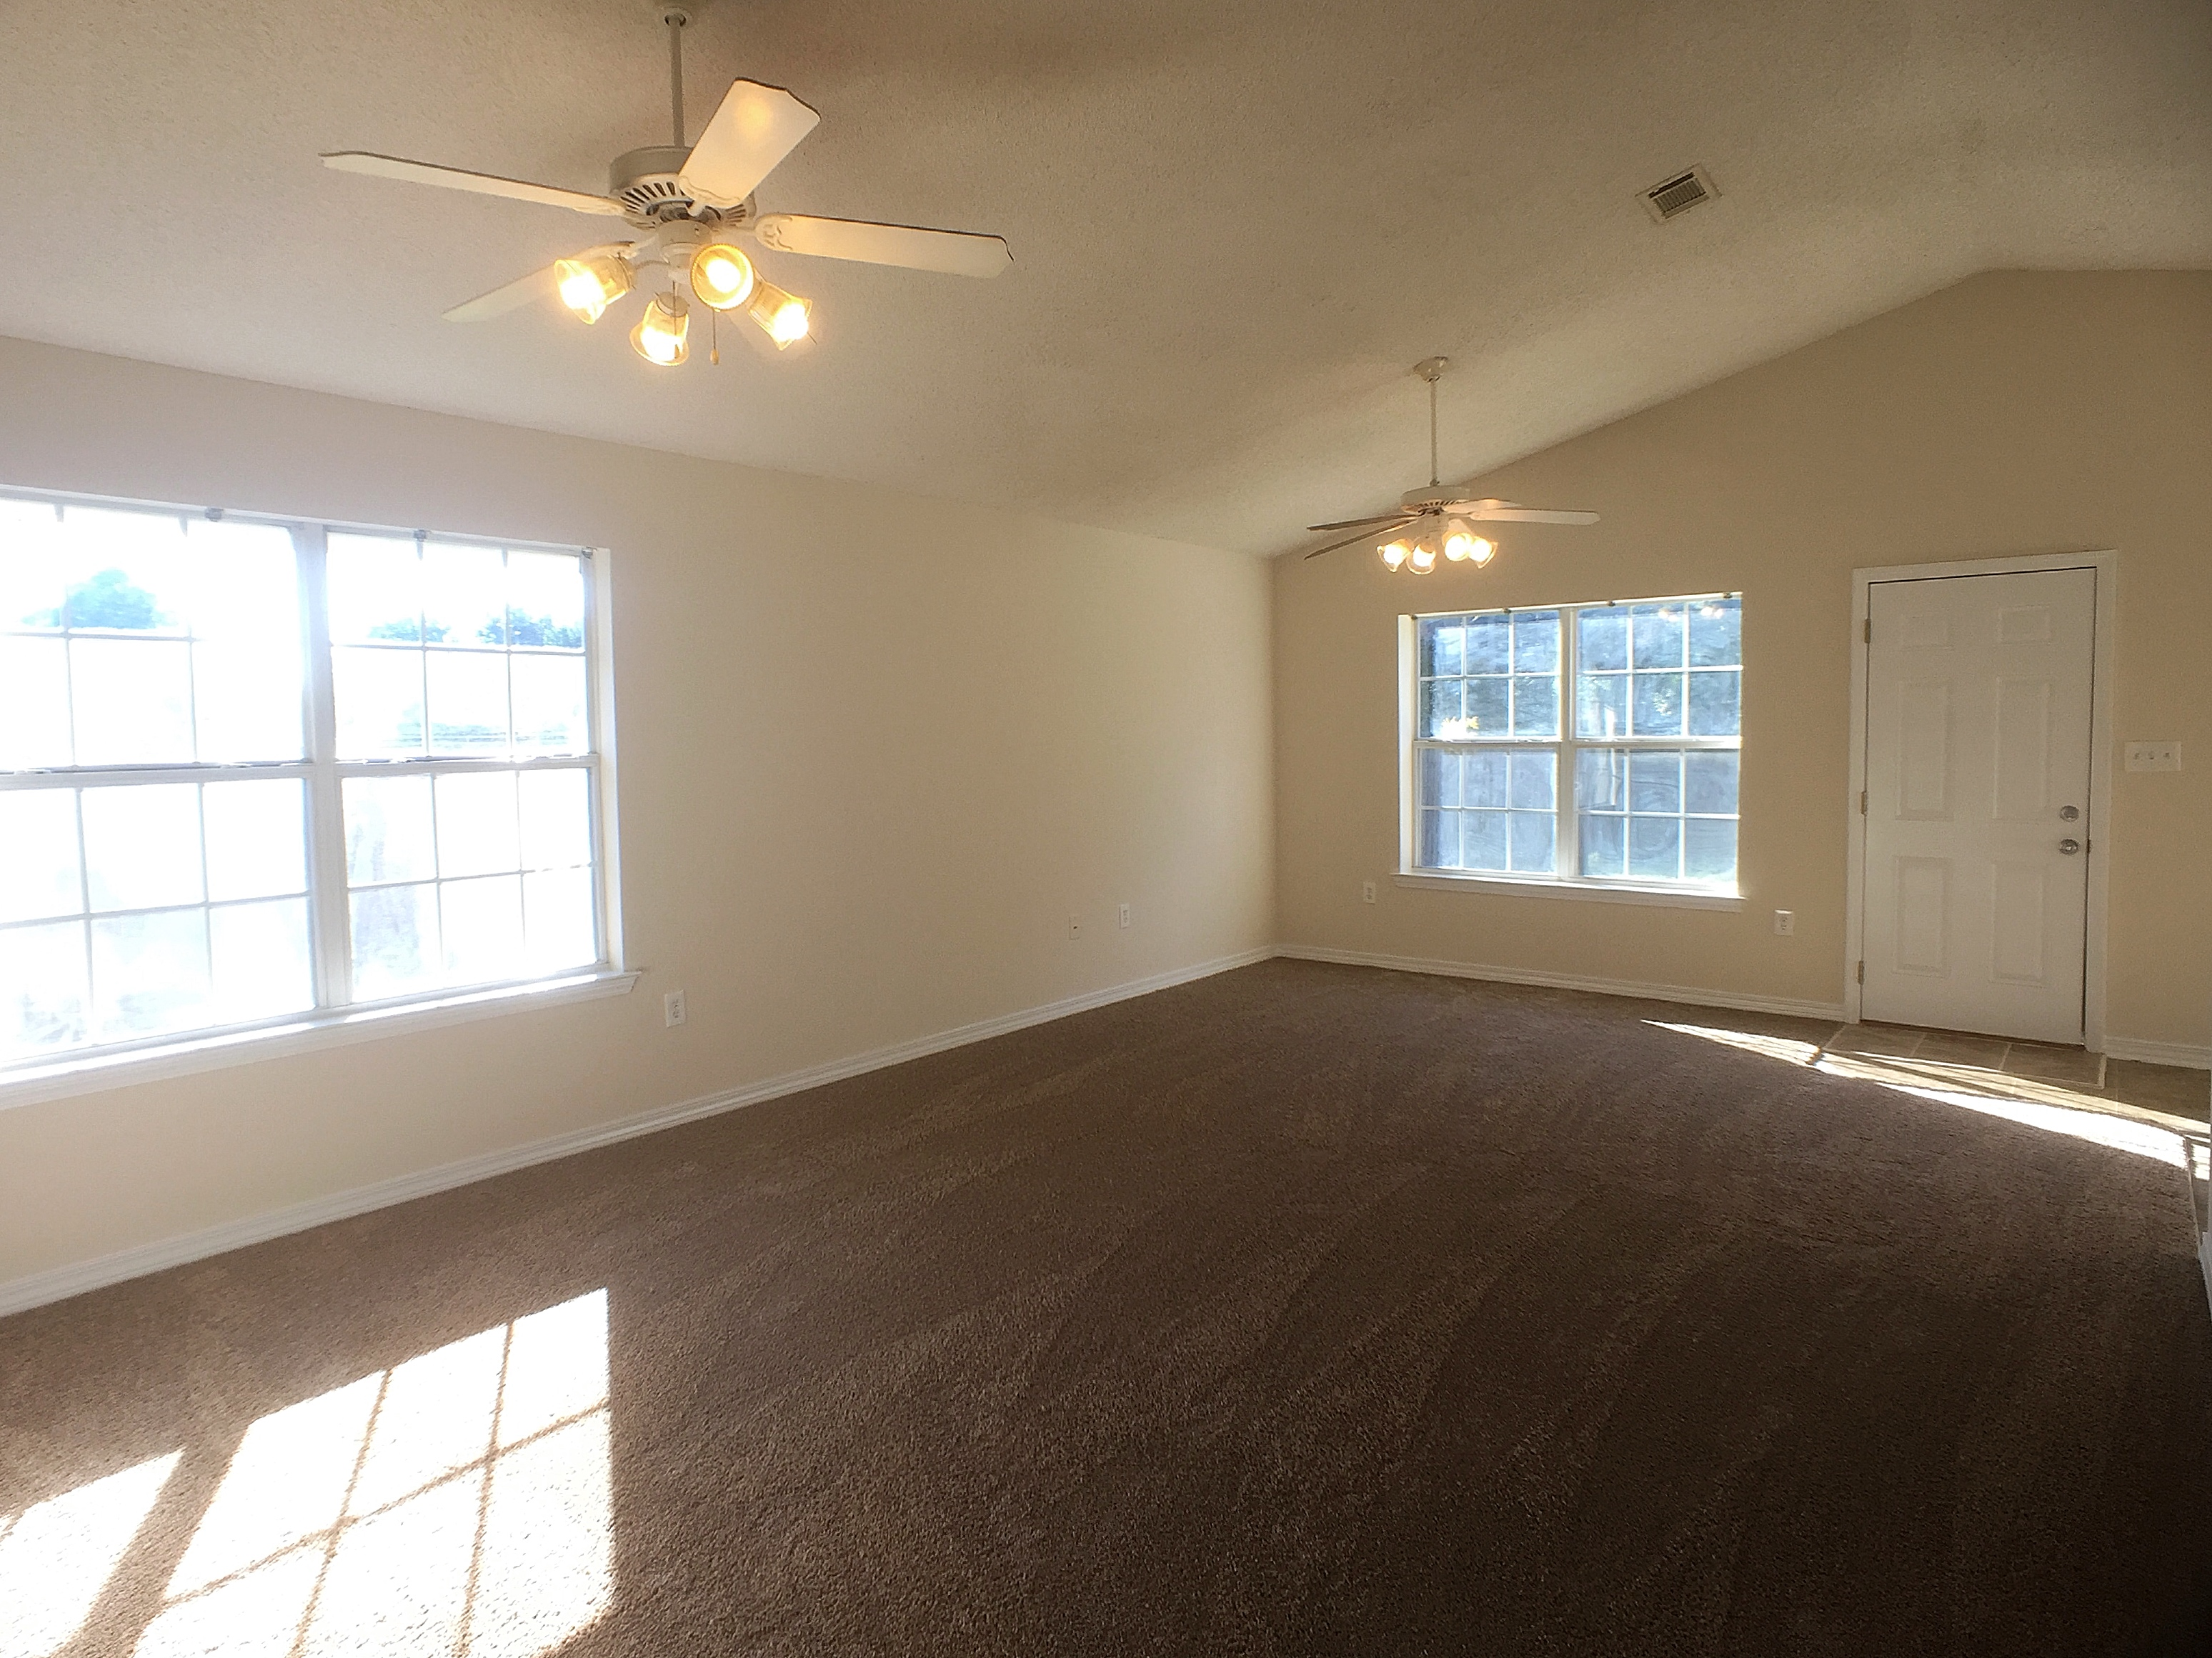 Rental Home in Gulf Breeze, Florida